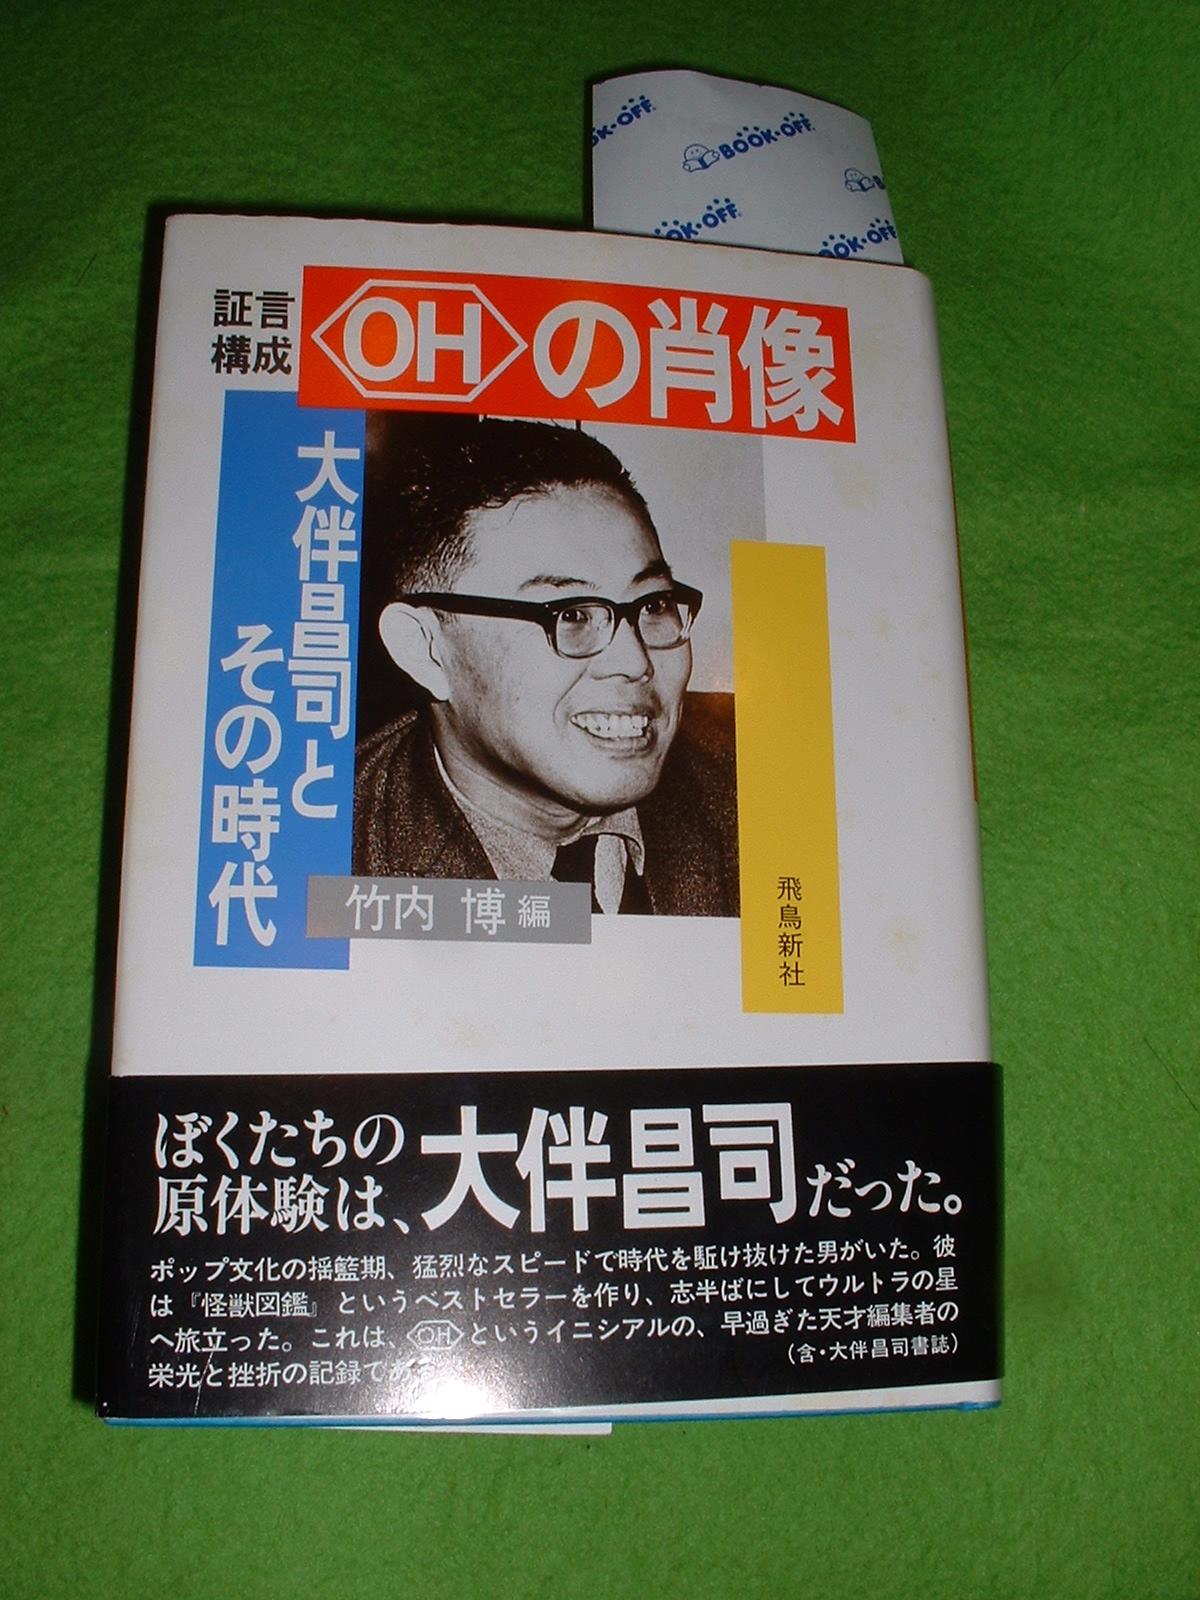 2014.07.13の散財 書籍 Doburoku-TAO.JPG